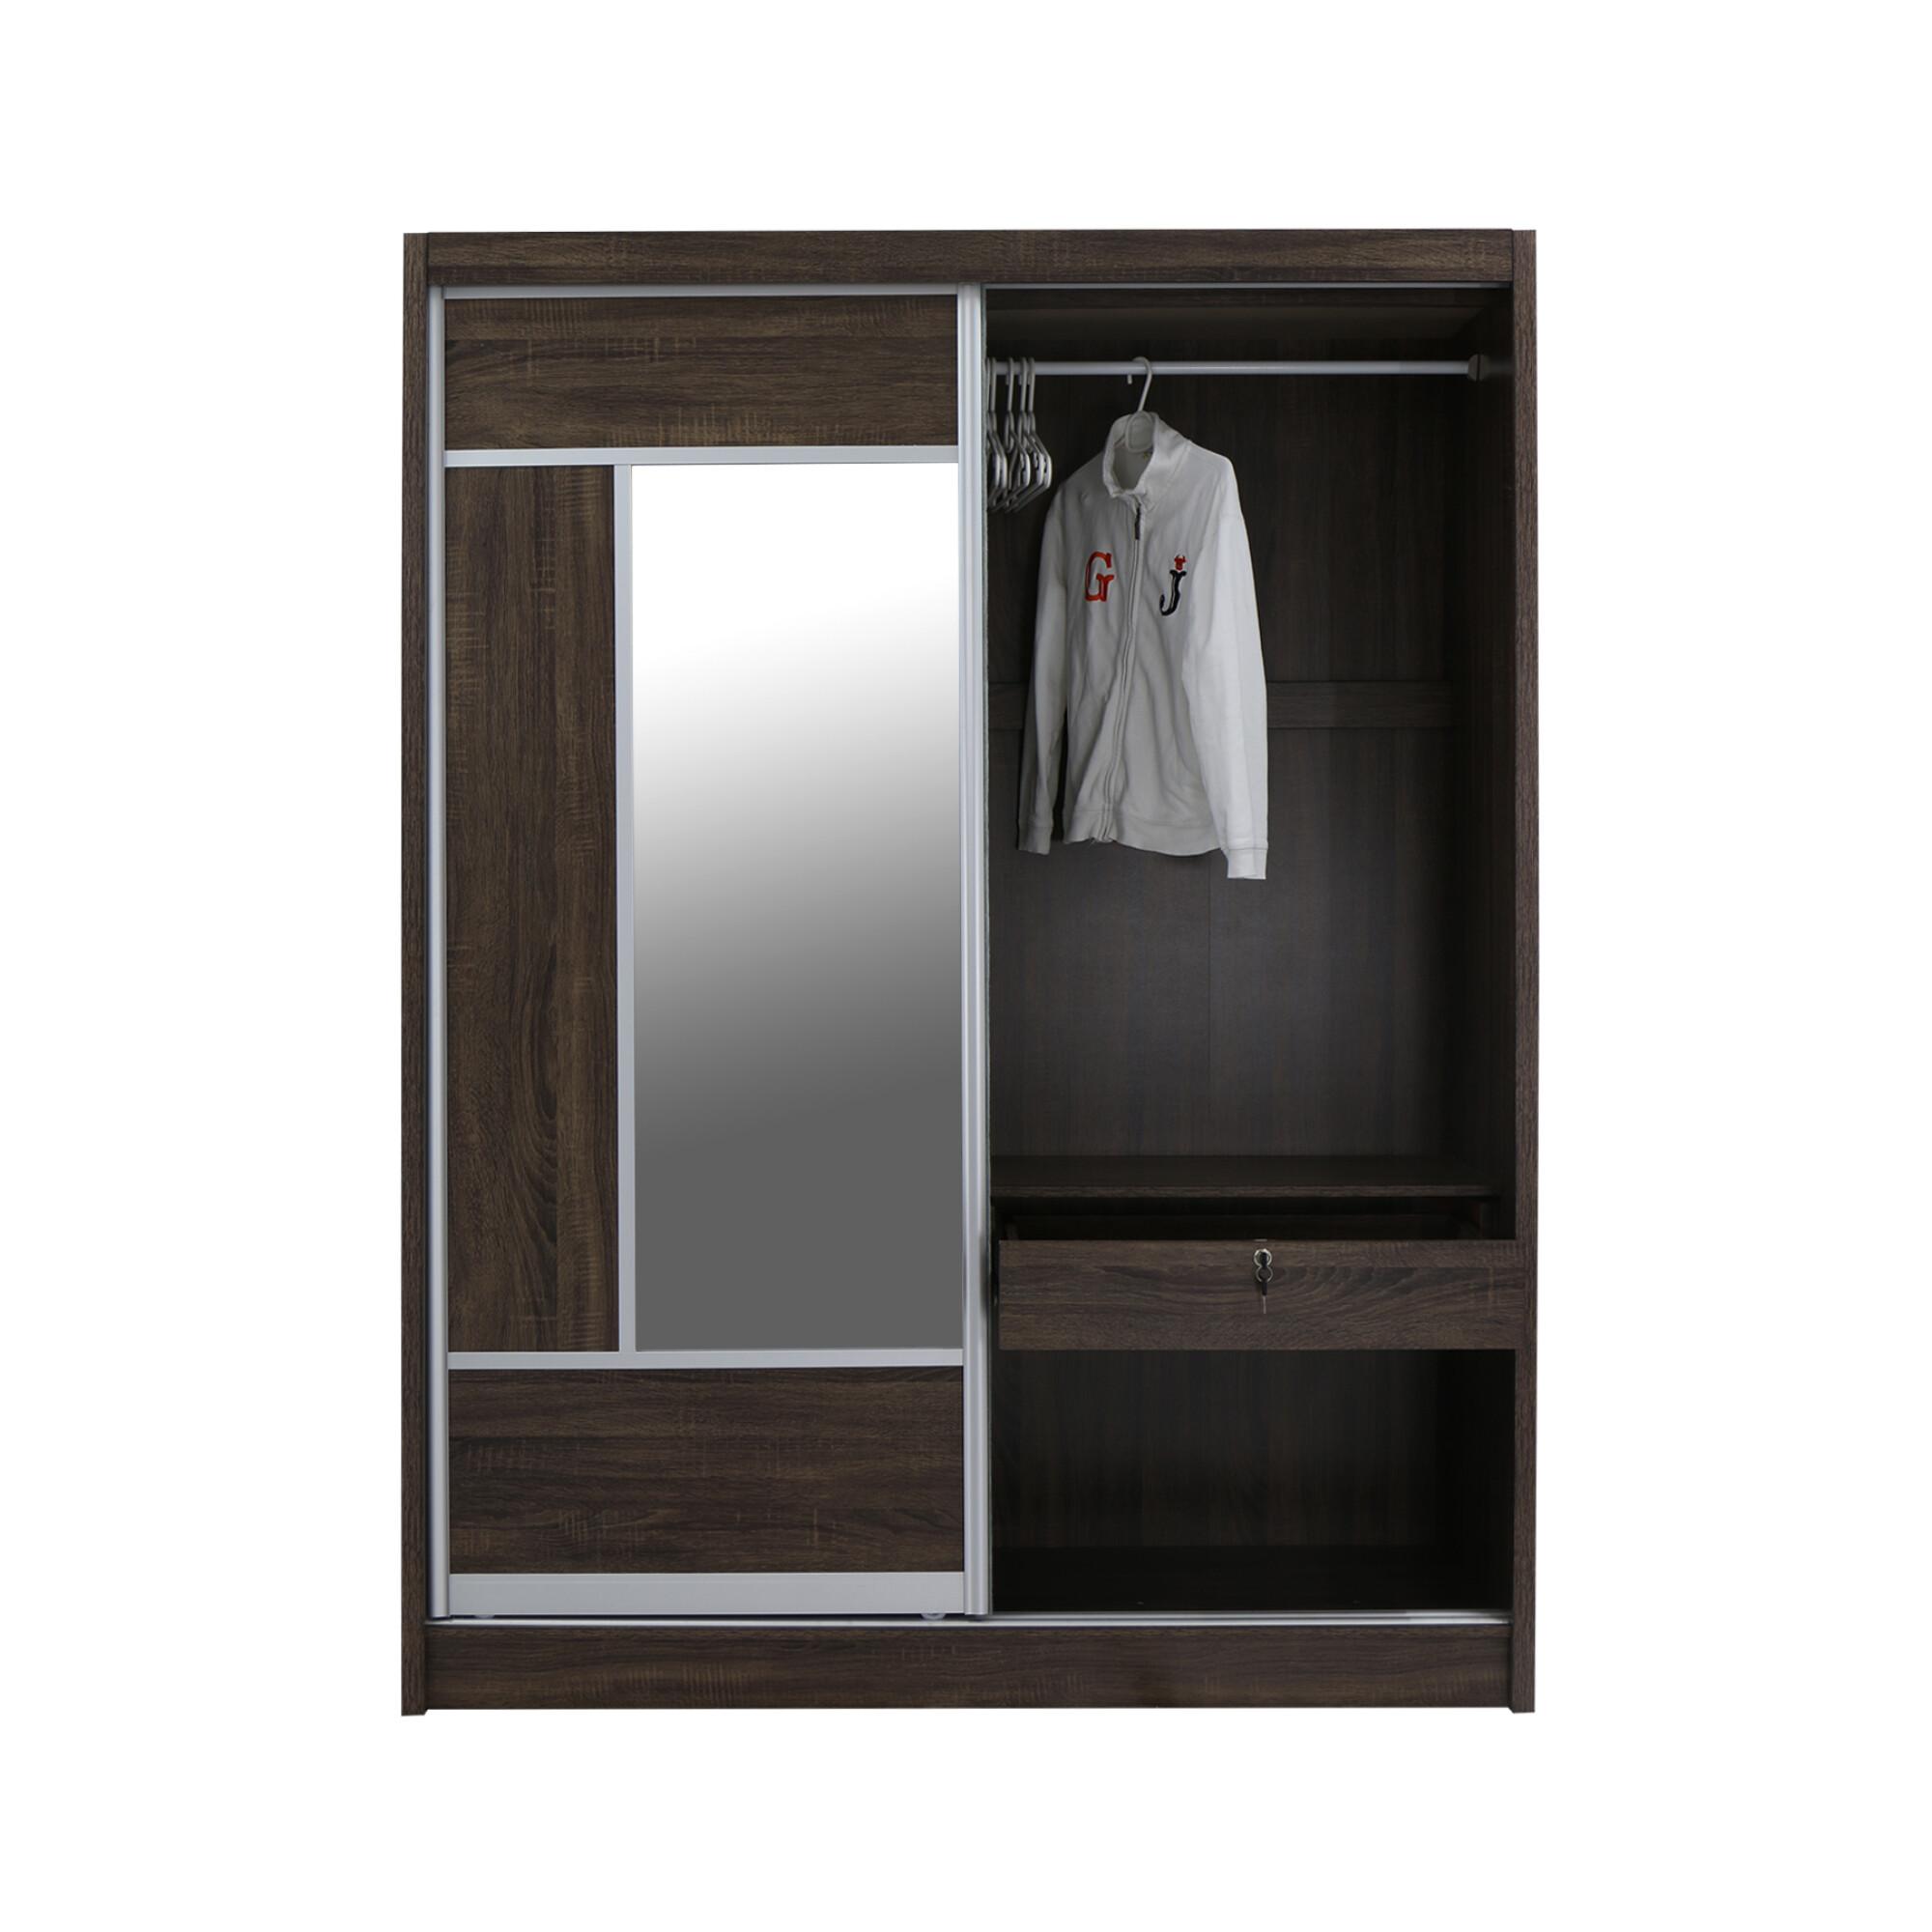 Alfred Sliding Door Wardrobe 5ft Walnut Furniture Home Dcor